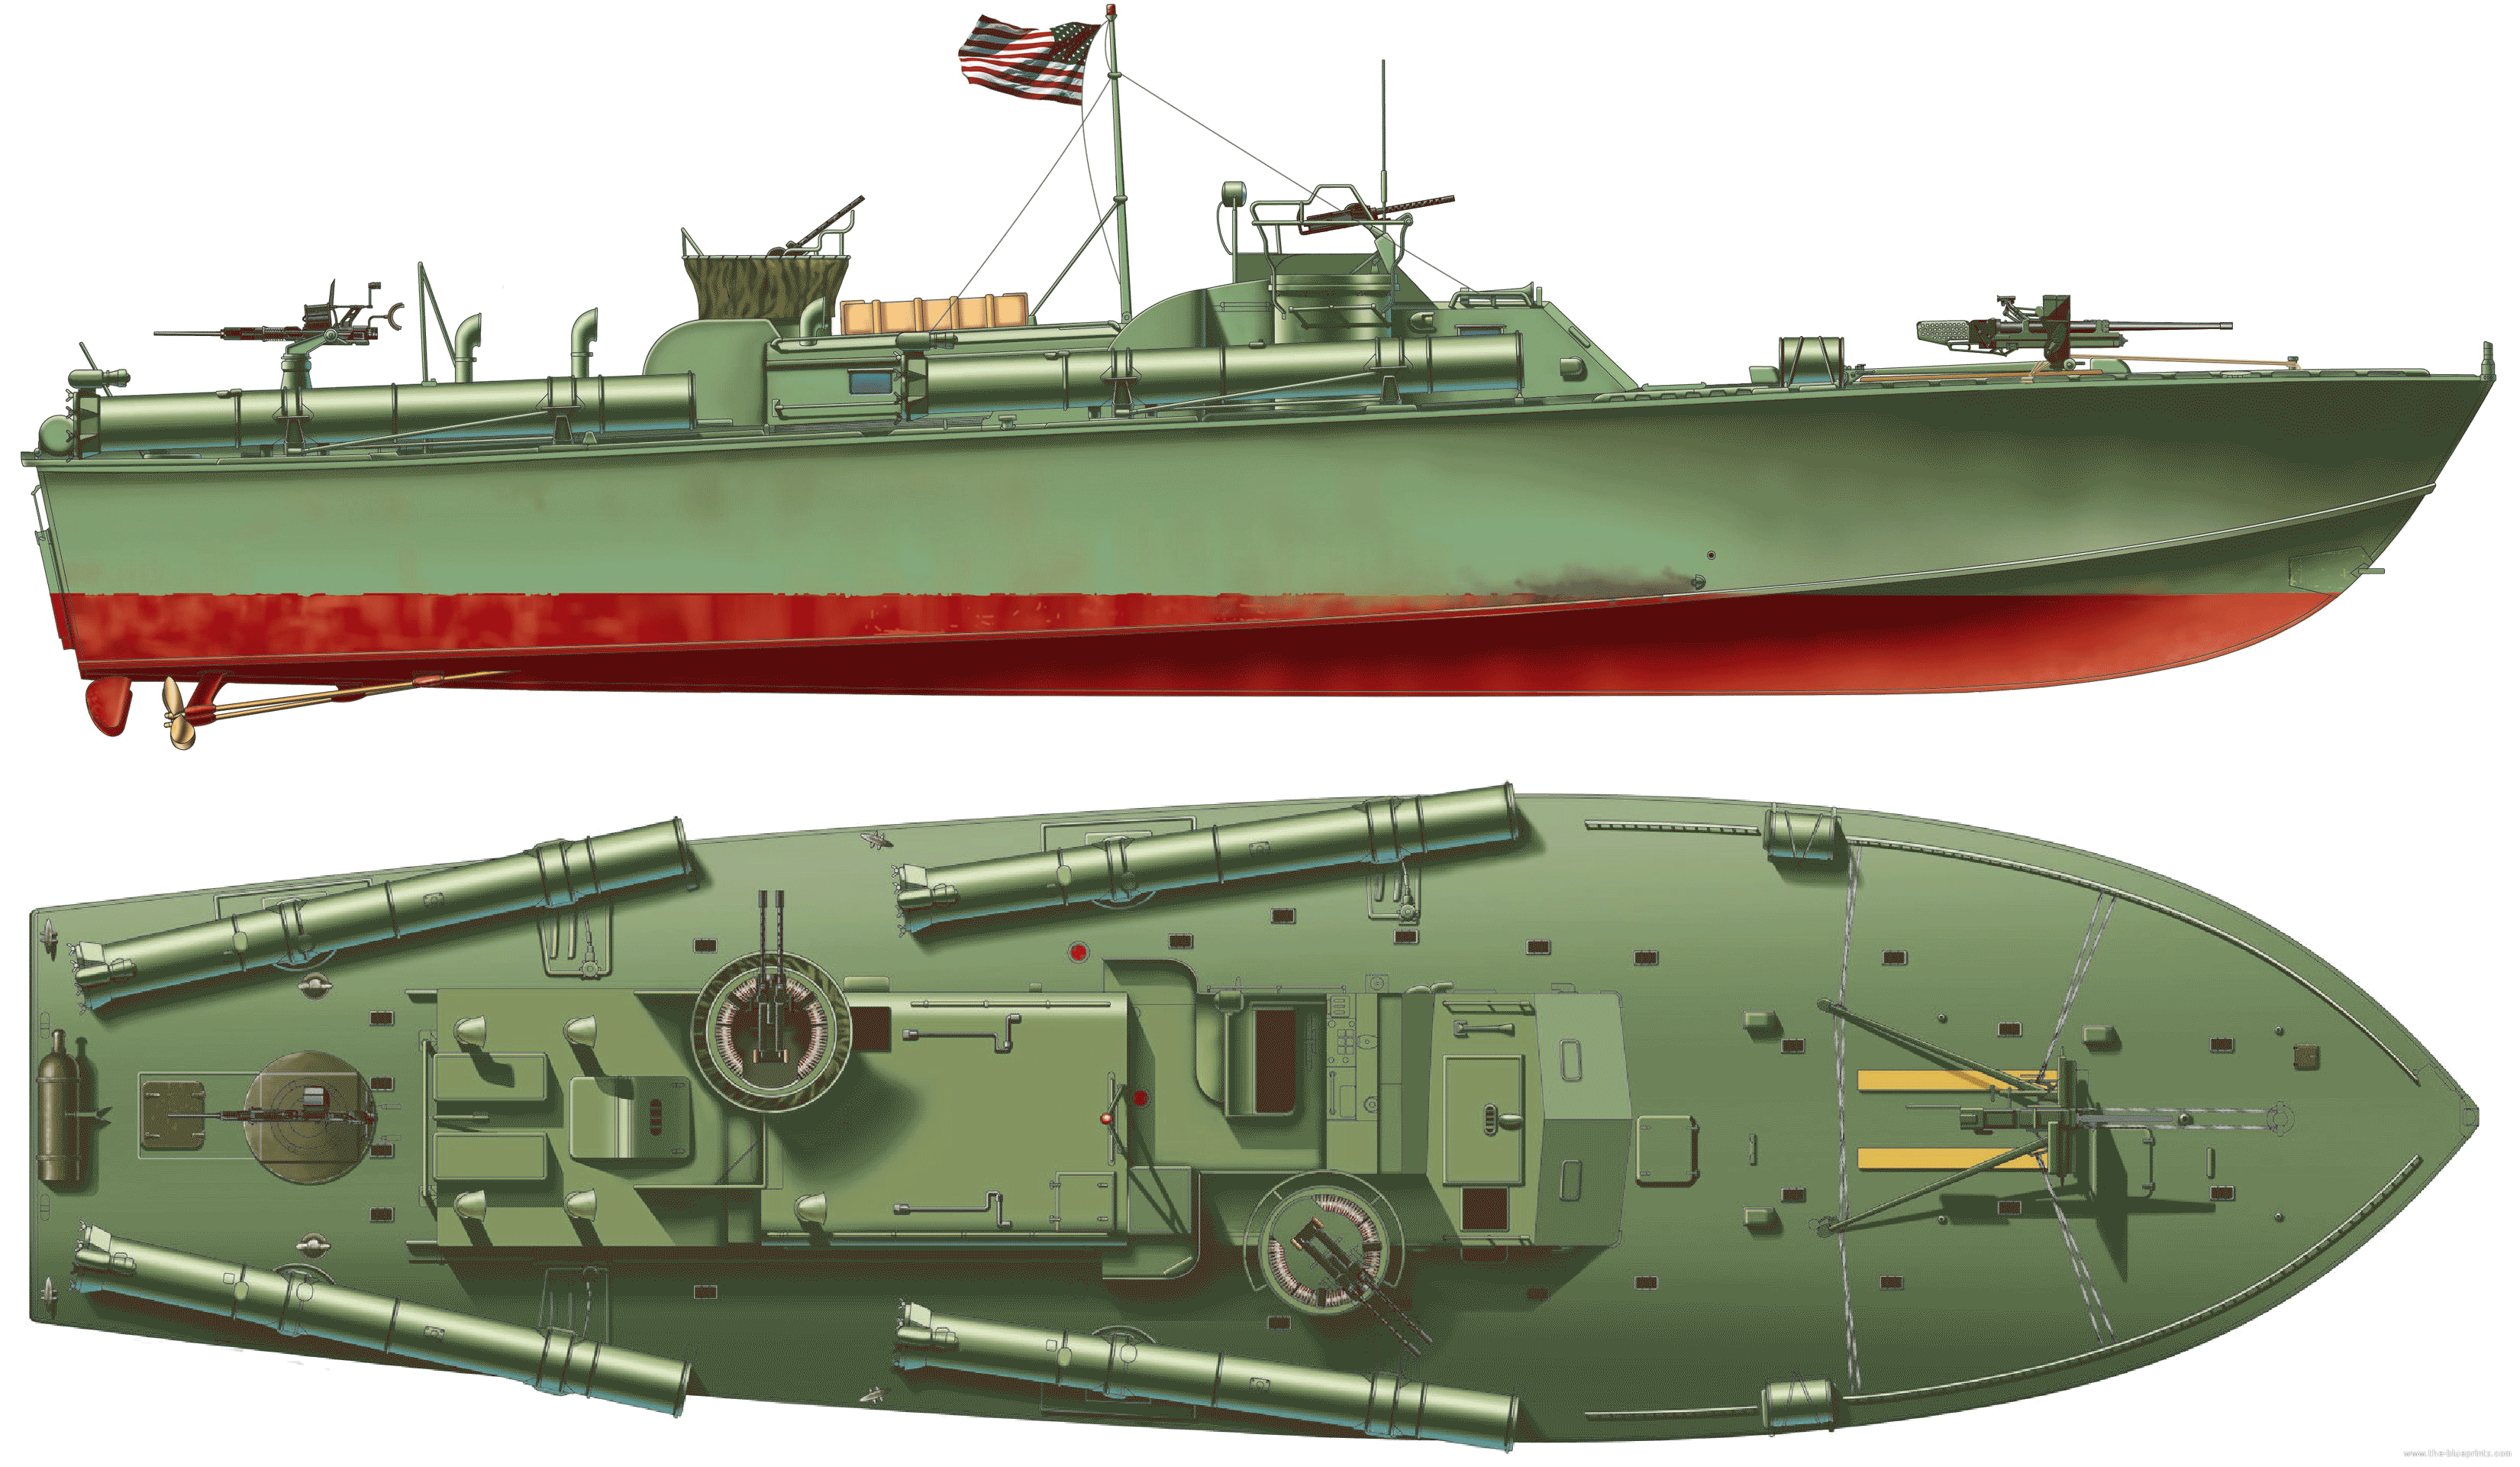 Pin by hjuy hgroo on c11 | Pt boat, Us navy ships, Navy ships